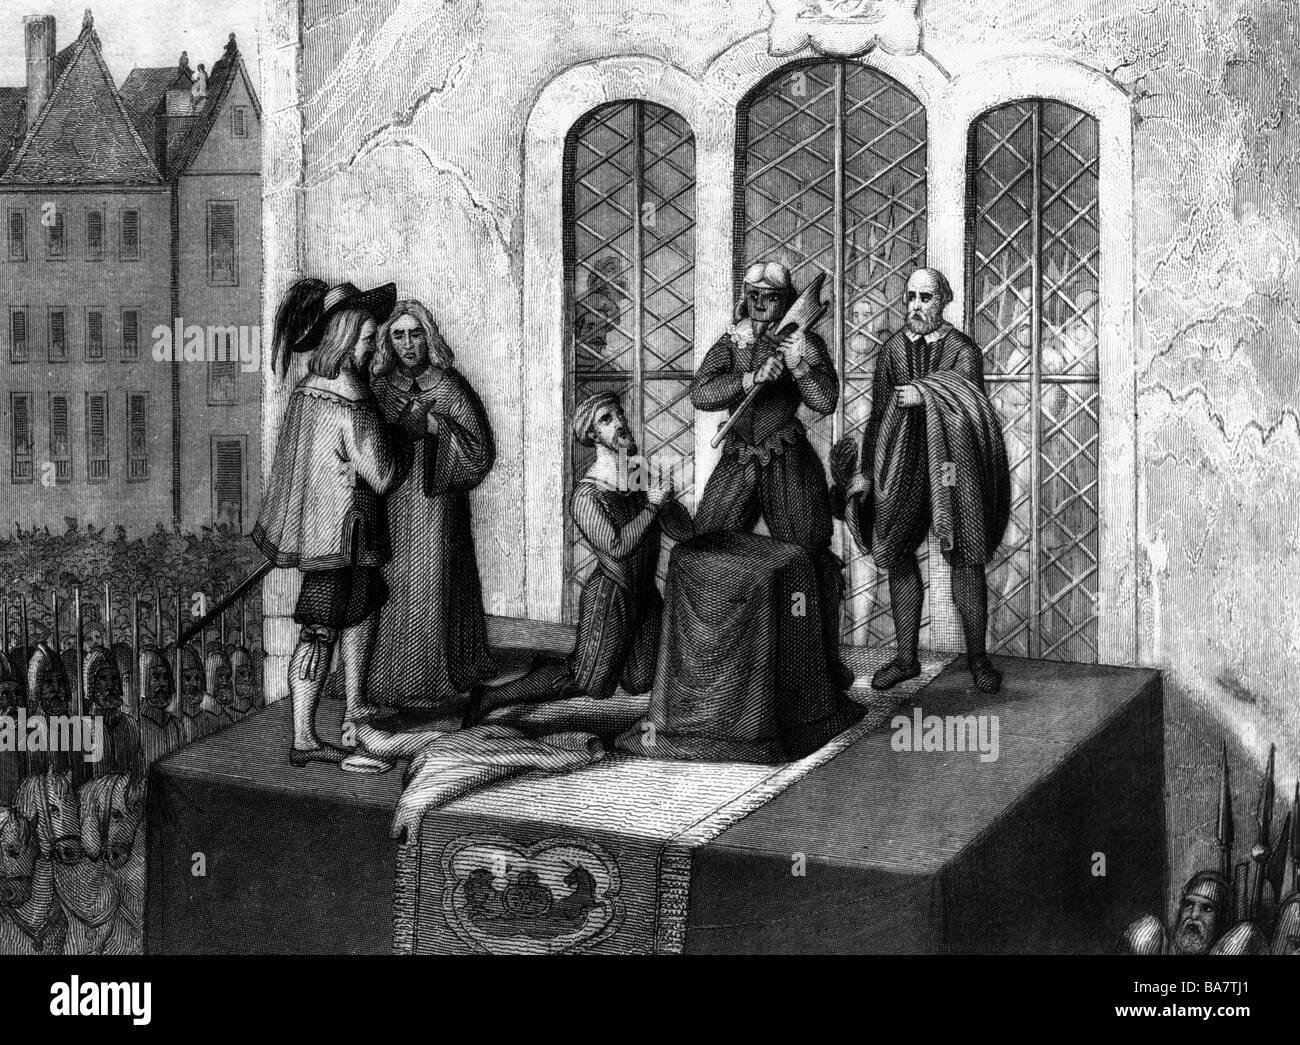 Execution of charles i essays